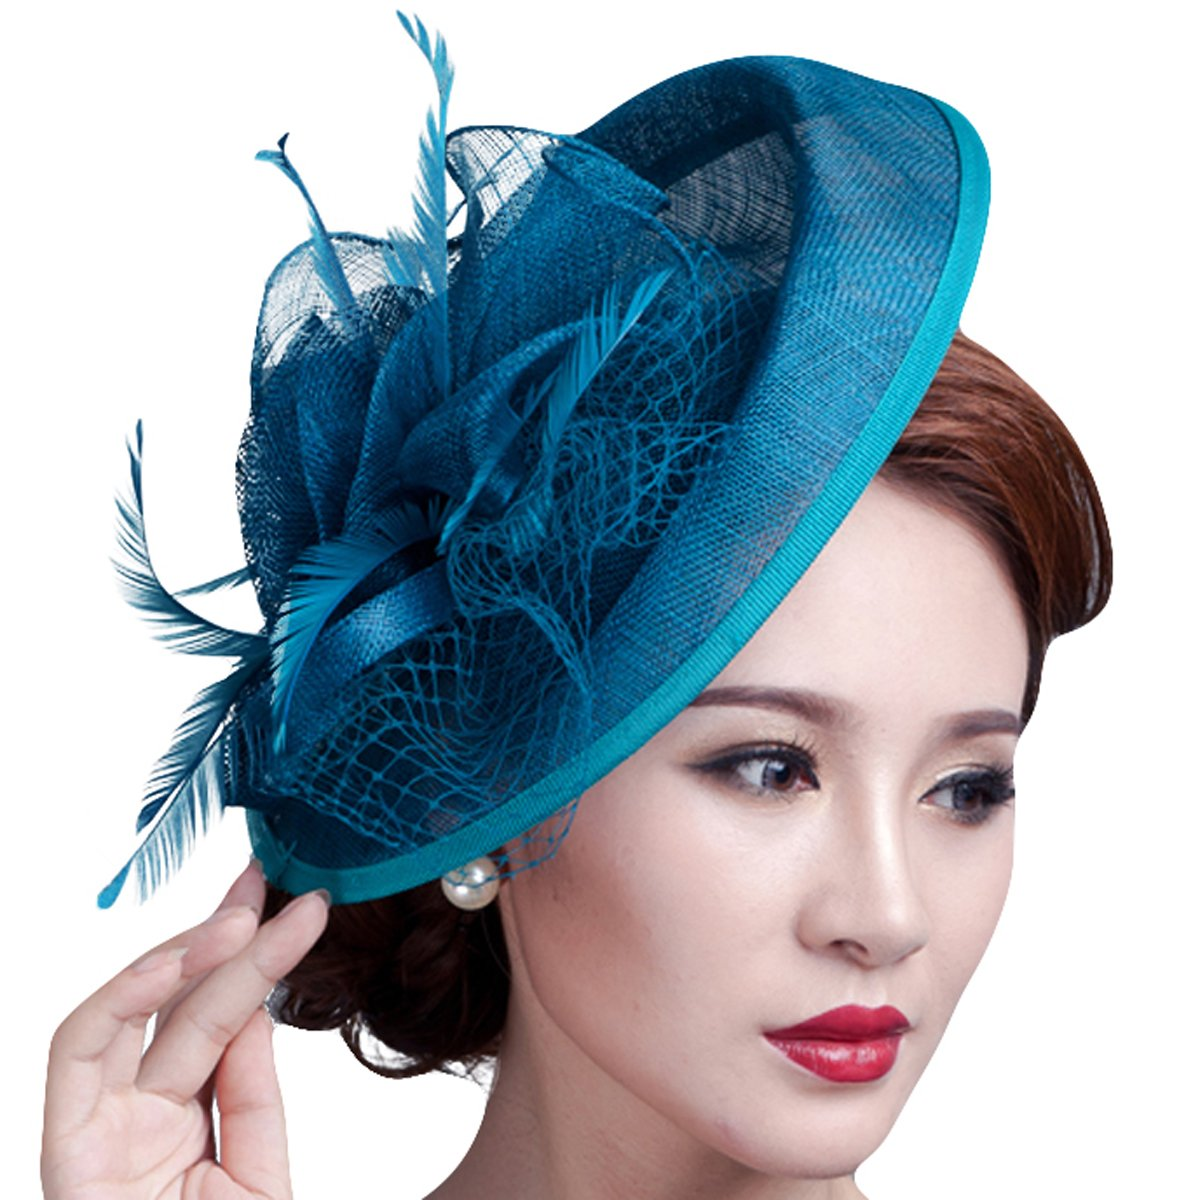 Fascigirl Party Fascinator Hair Clip Pillbox Hat Cocktail Kentucky Derby Hat for Ladies